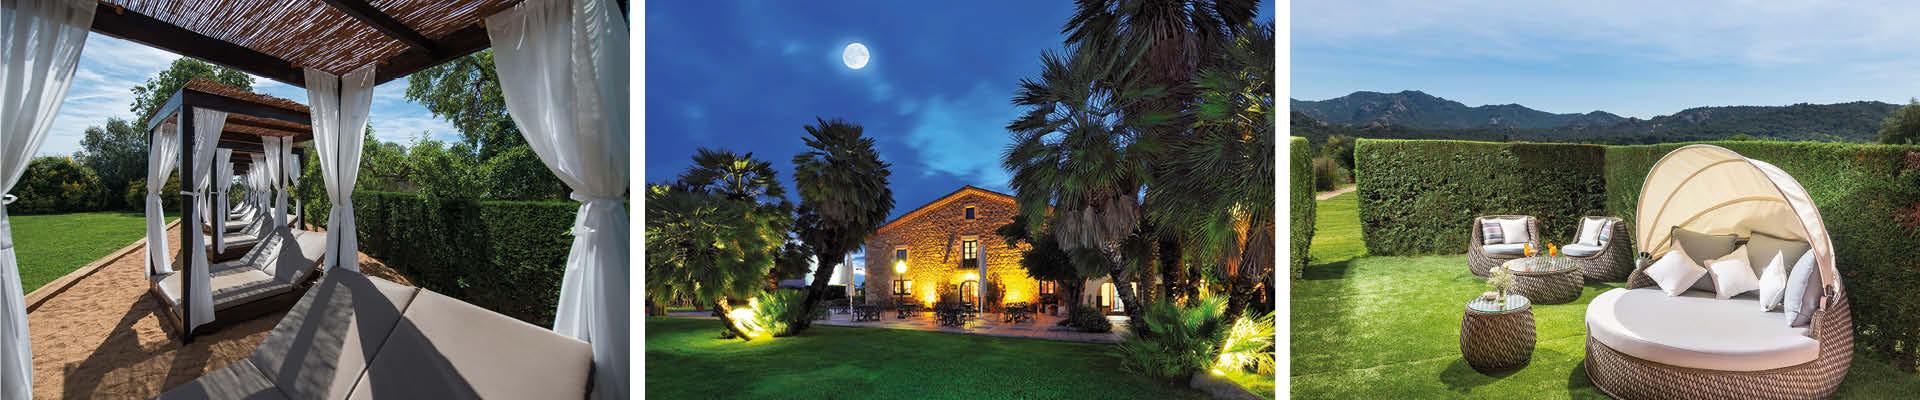 Das Bild zeigt das Hotel Hotel Mas Tapiolas